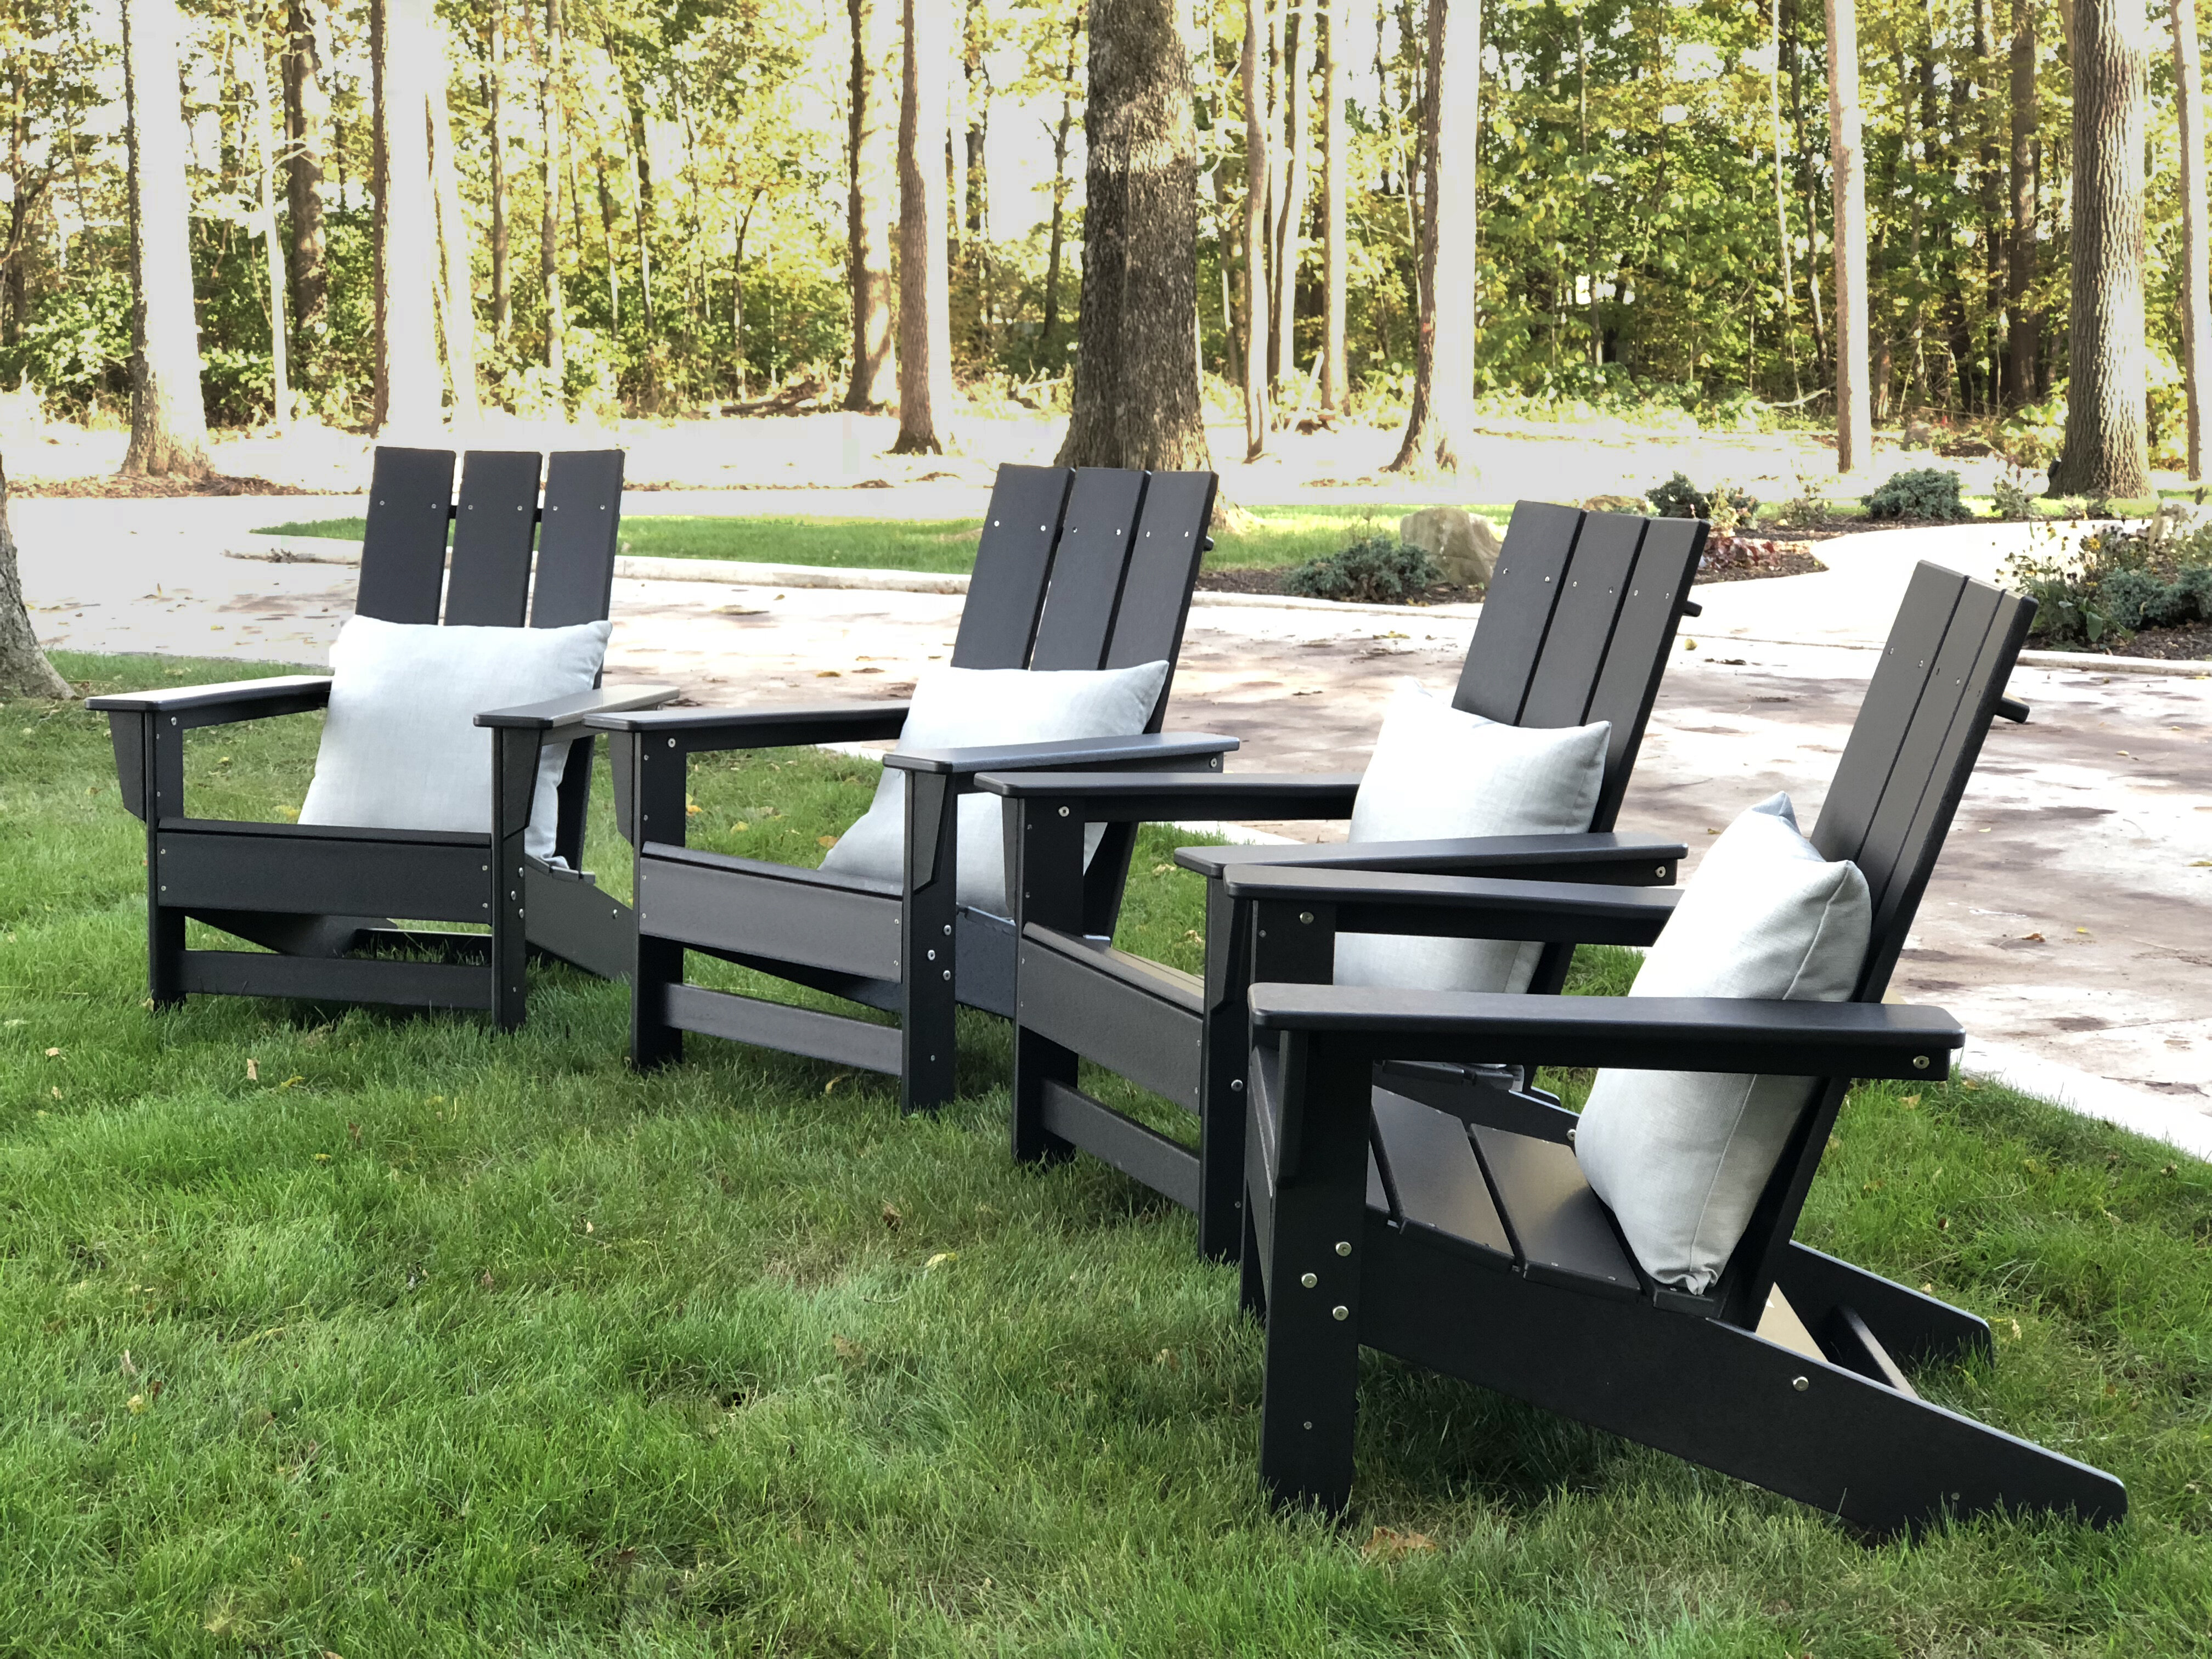 Foundstone Marvin Plastic Resin Adirondack Chair Reviews Wayfair